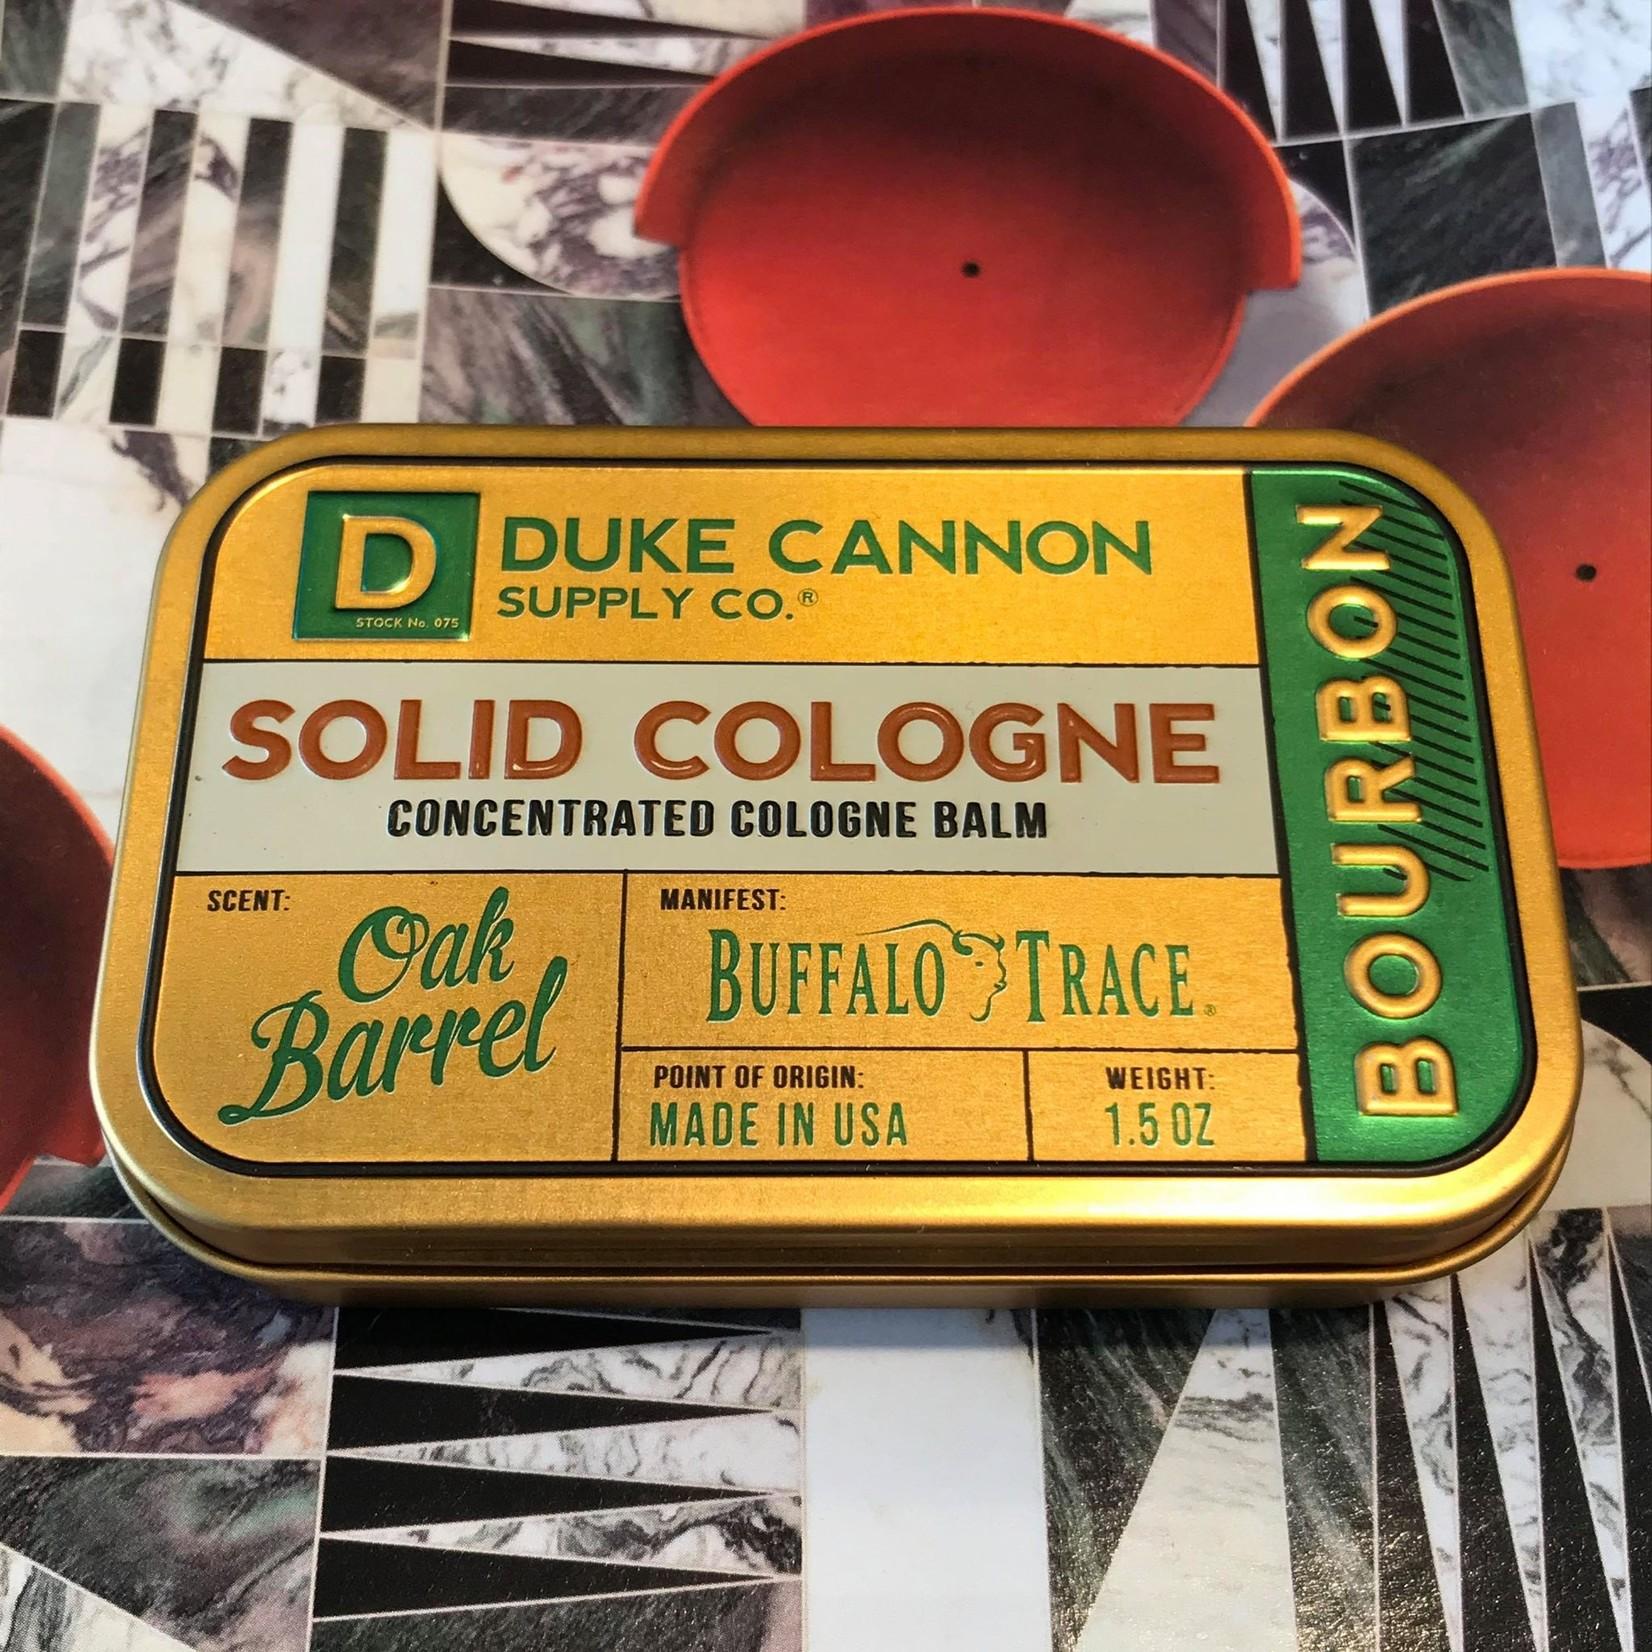 Duke Cannon Duke Cannon Solid Cologne